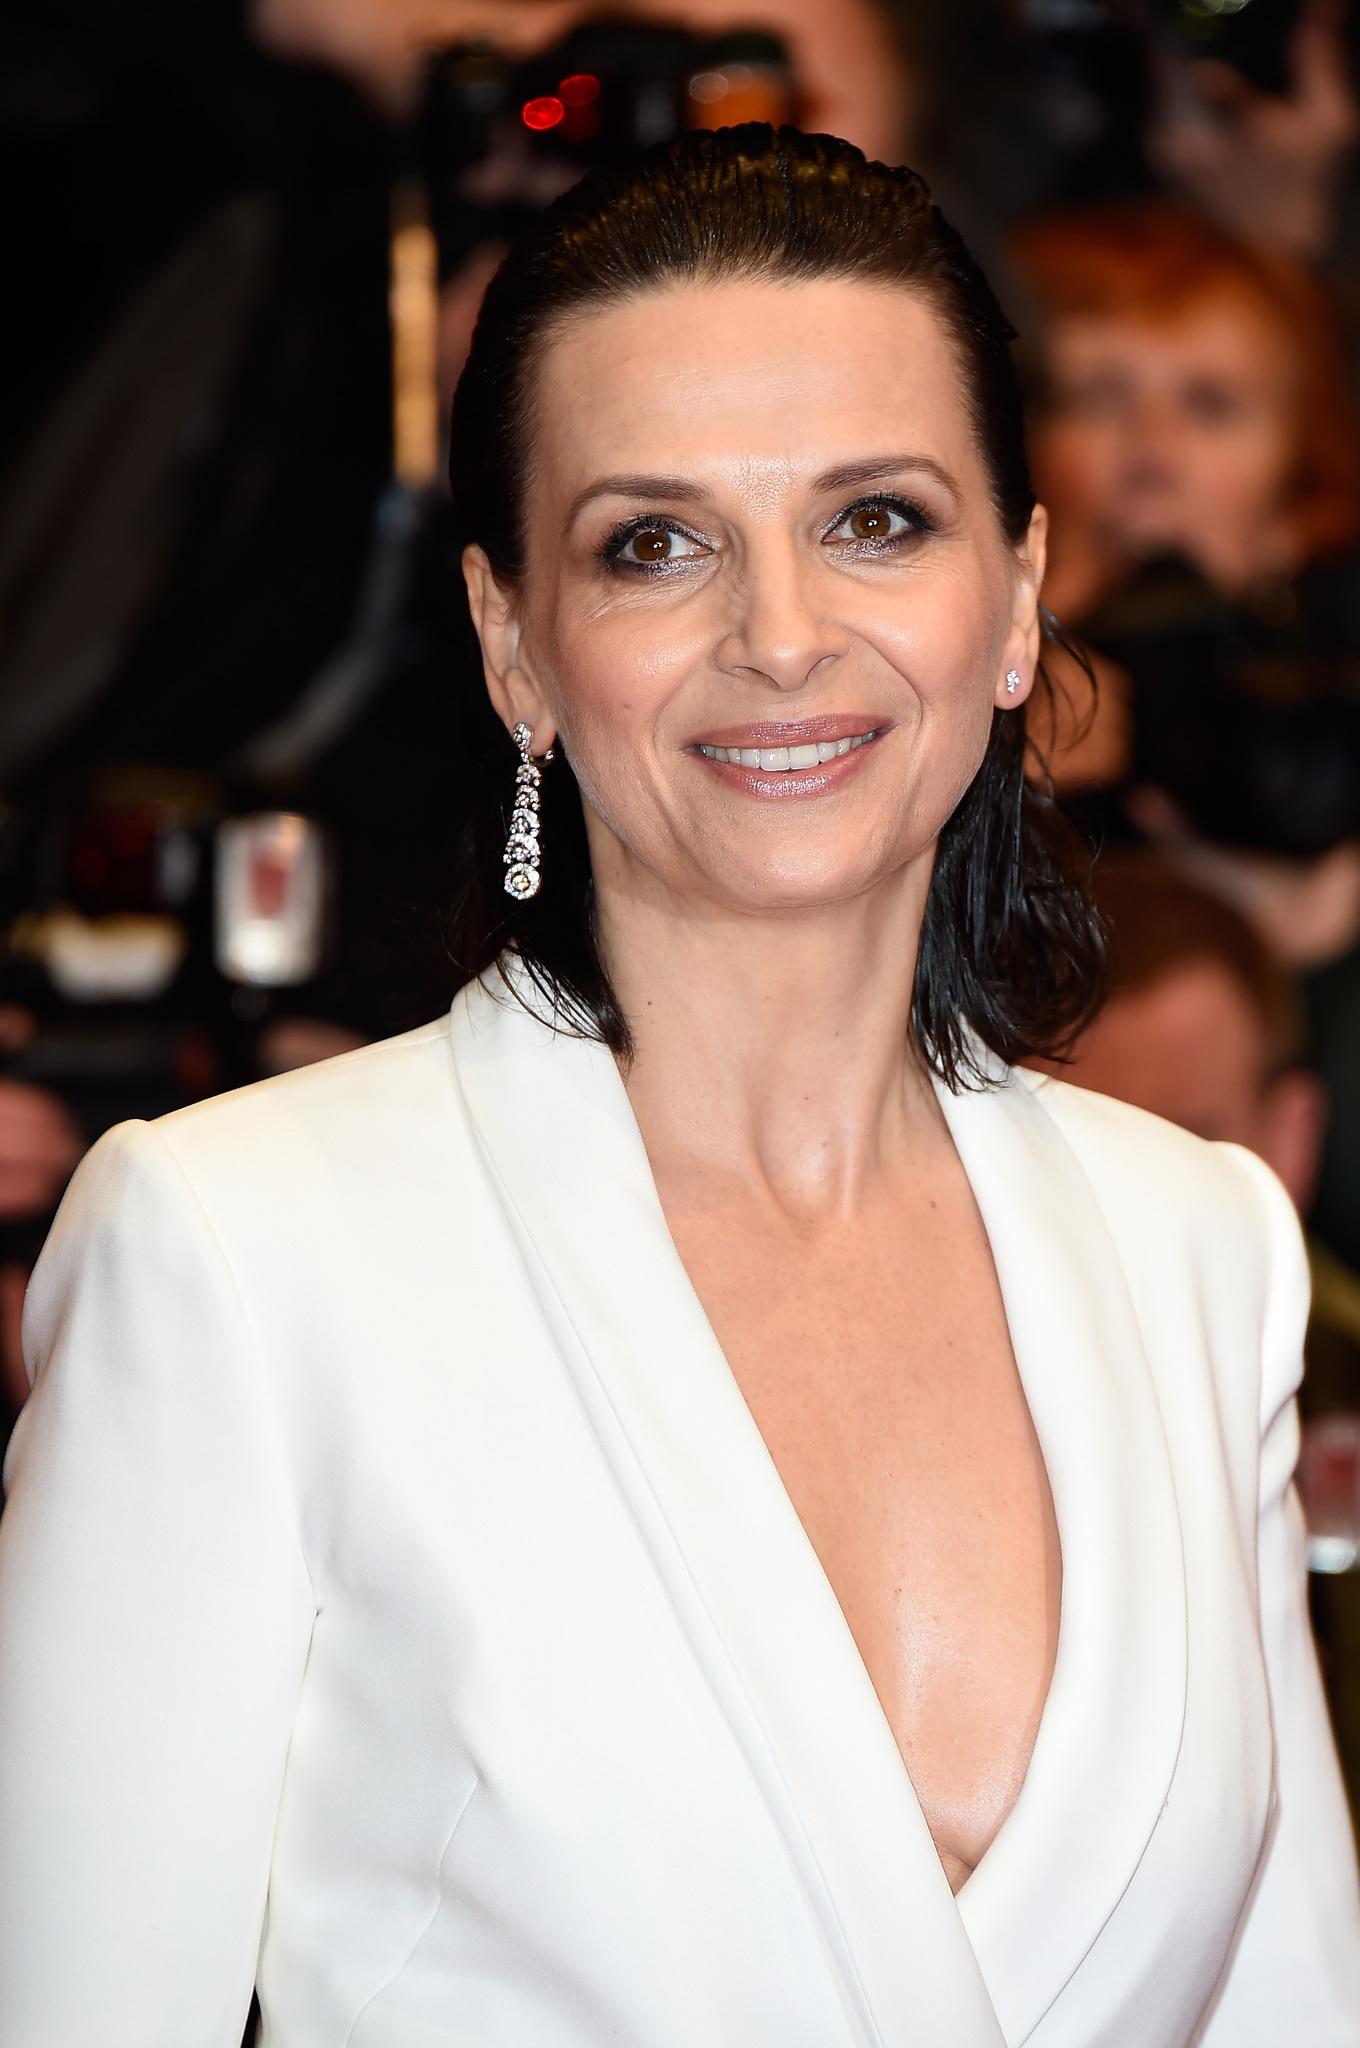 Juliette Binoche at an event for Nadie quiere la noche (2015)